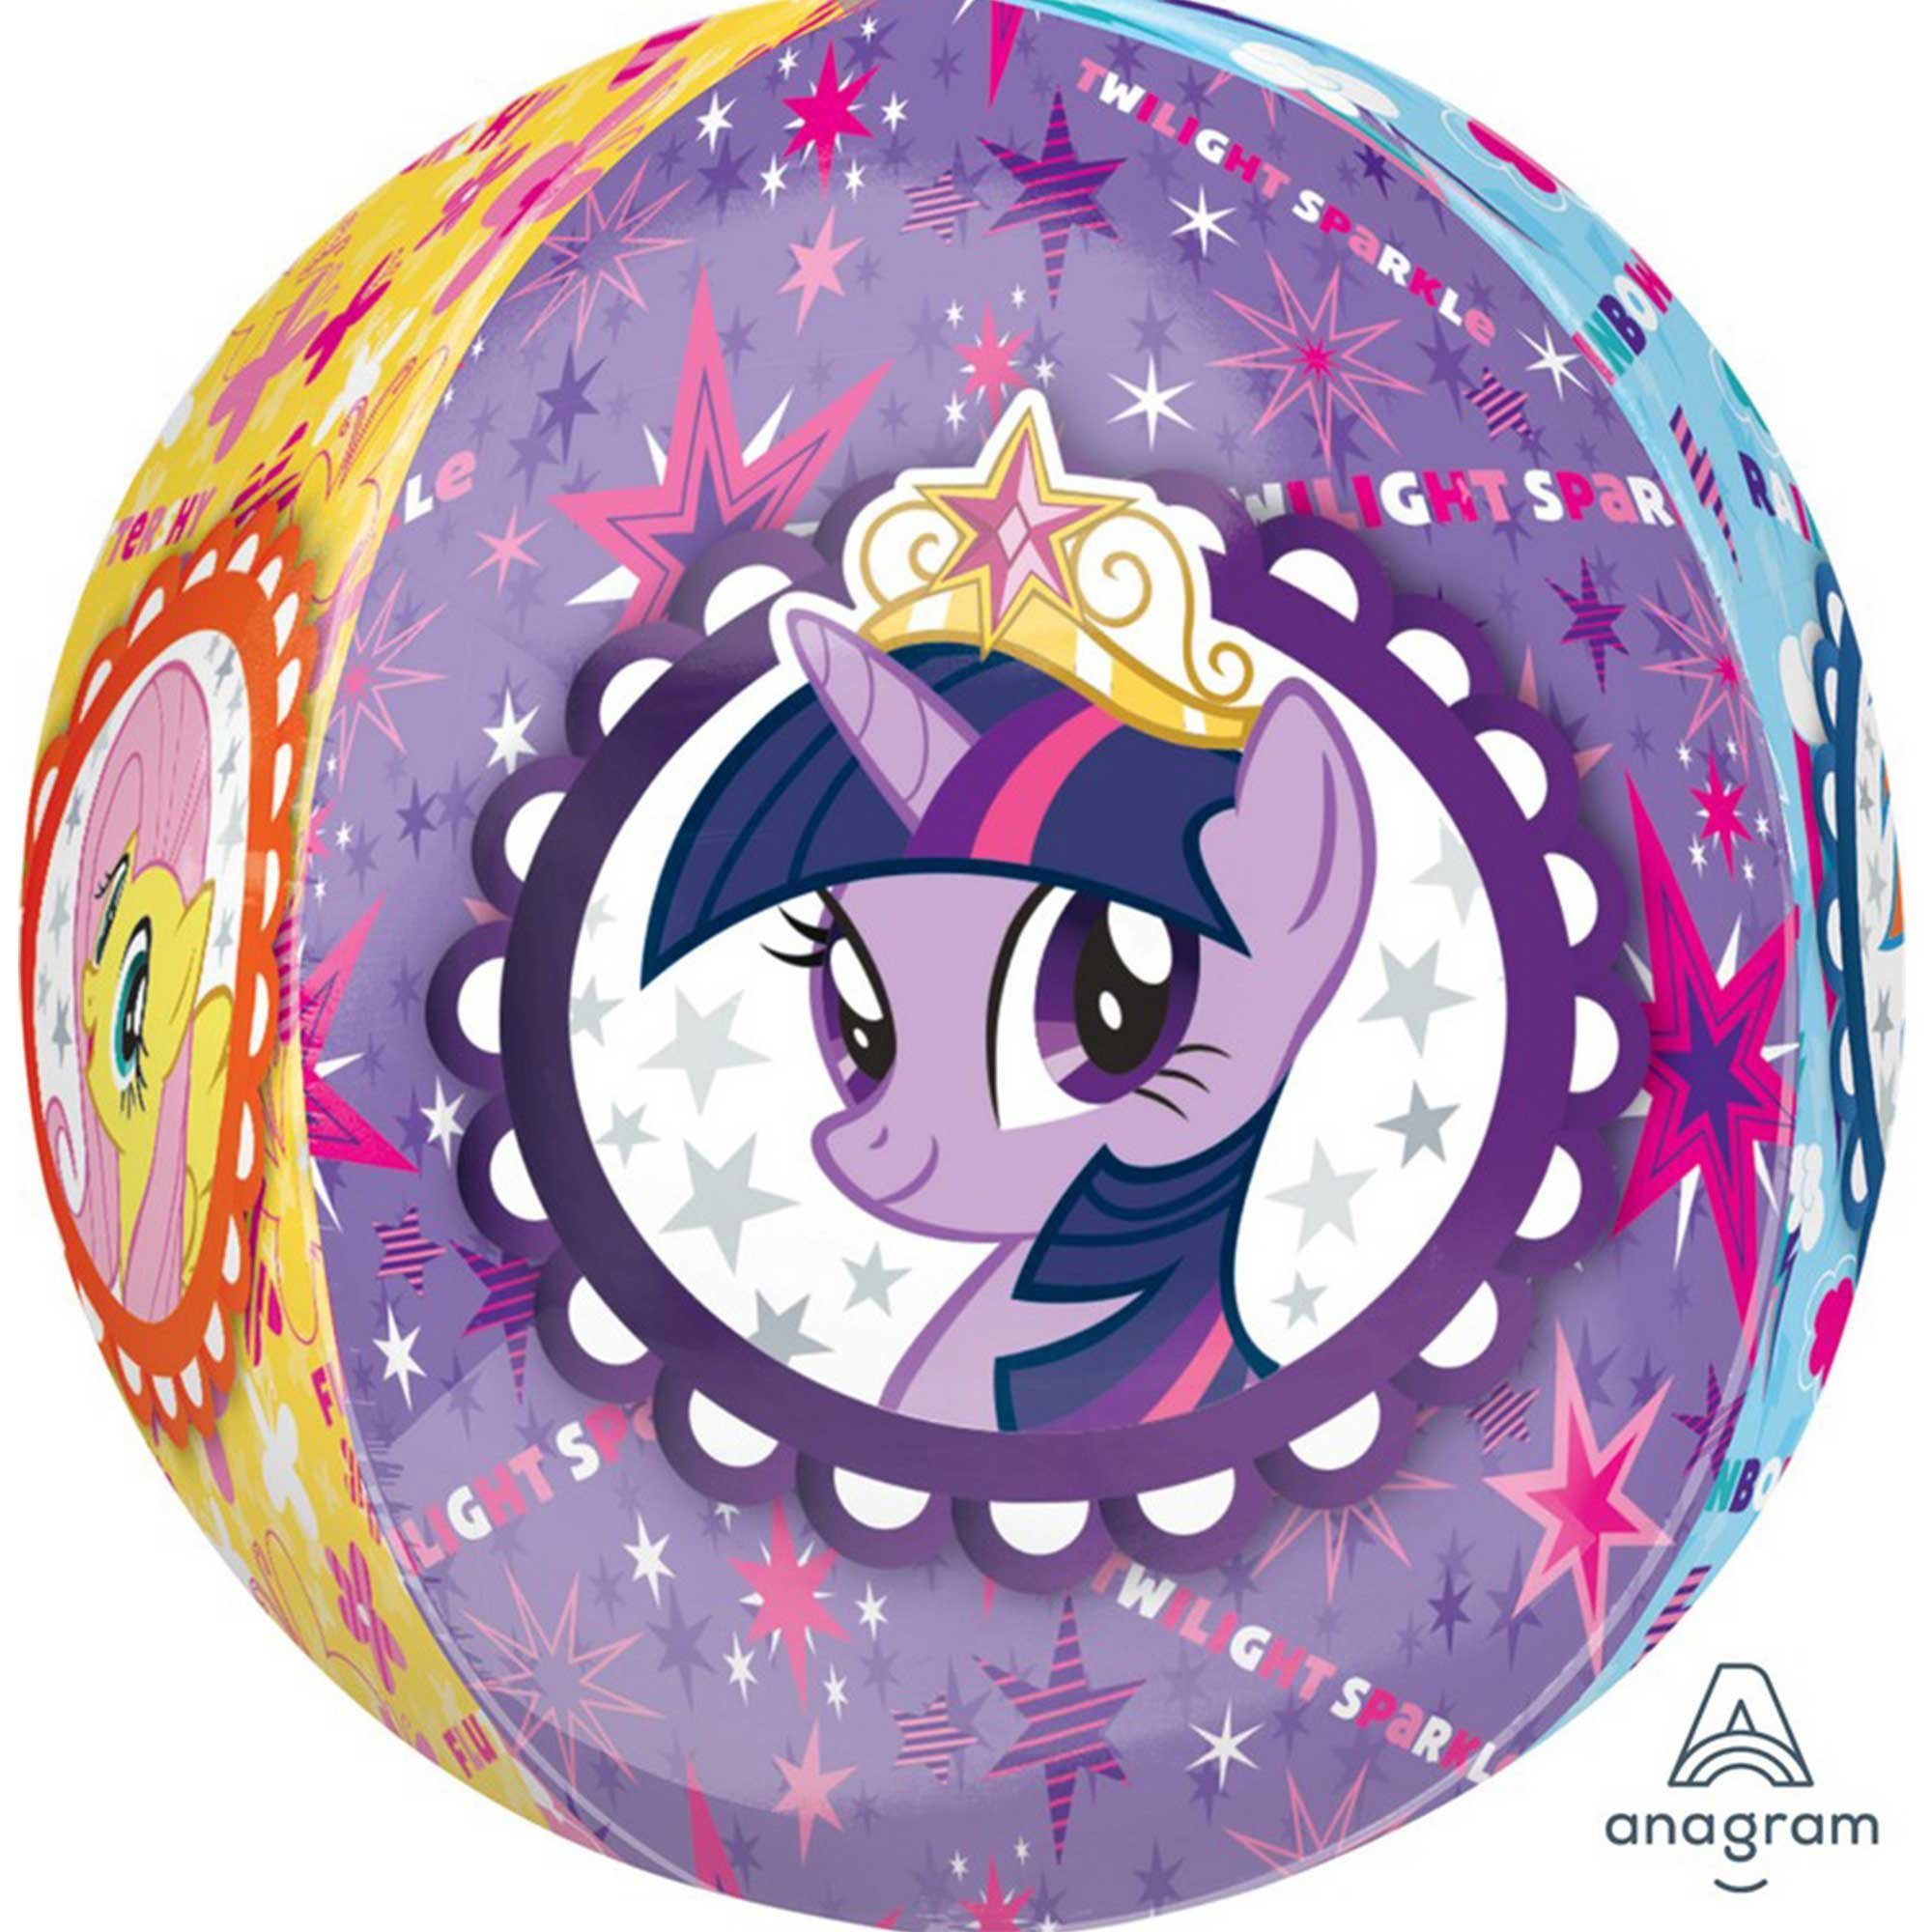 Orbz XL My Little Pony G40